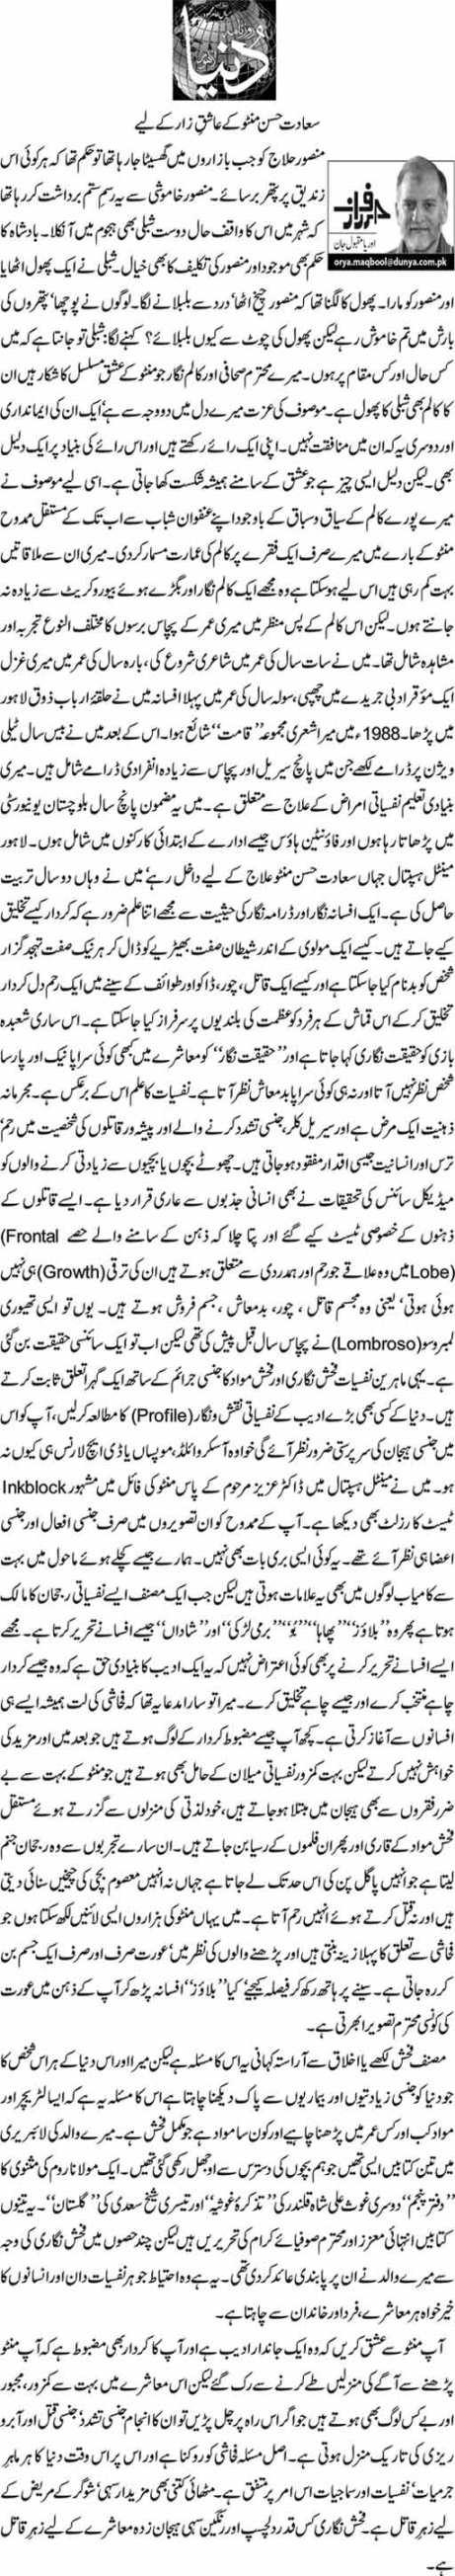 Sadat Hassan Manto Ky Aashiq e Zar Ky Liye - Orya Maqbool Jan